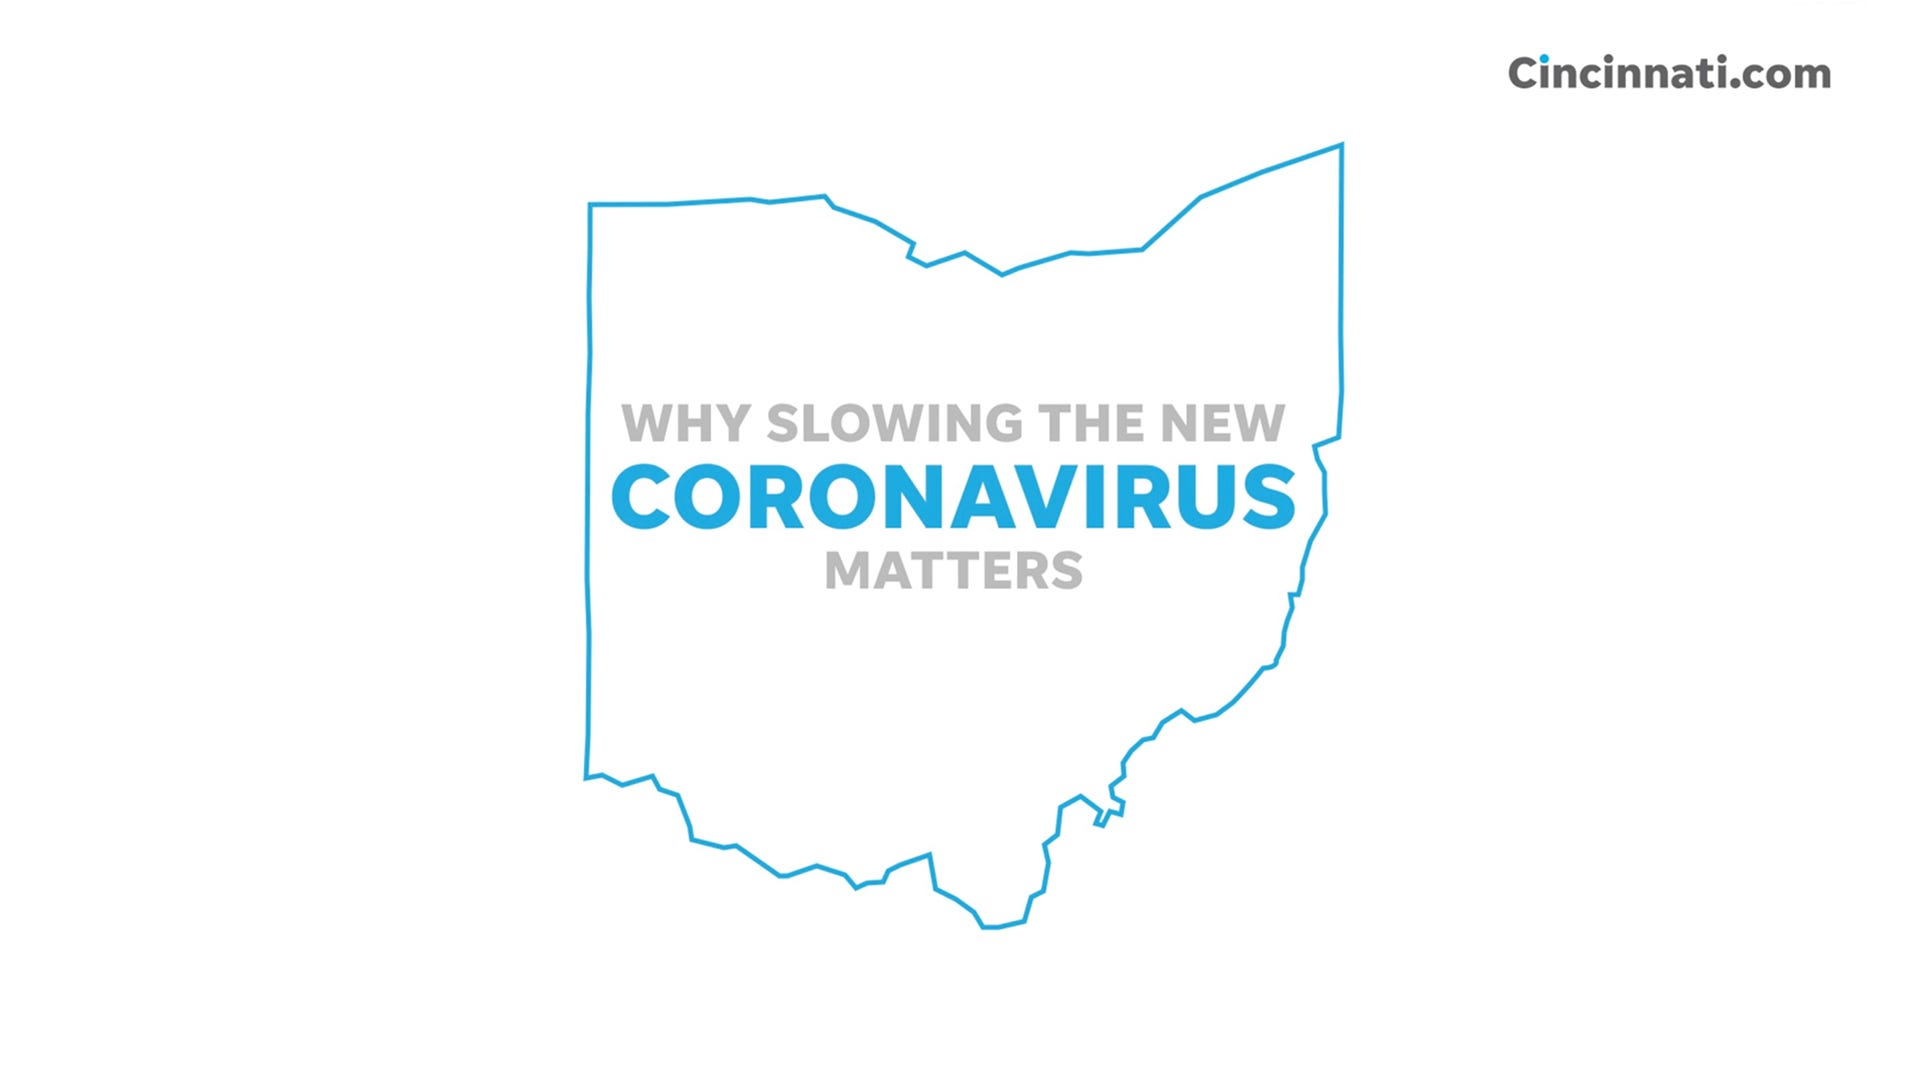 Coronavirus Order To Authorize Hamilton County Sheriff To Release Low Risk Inmates